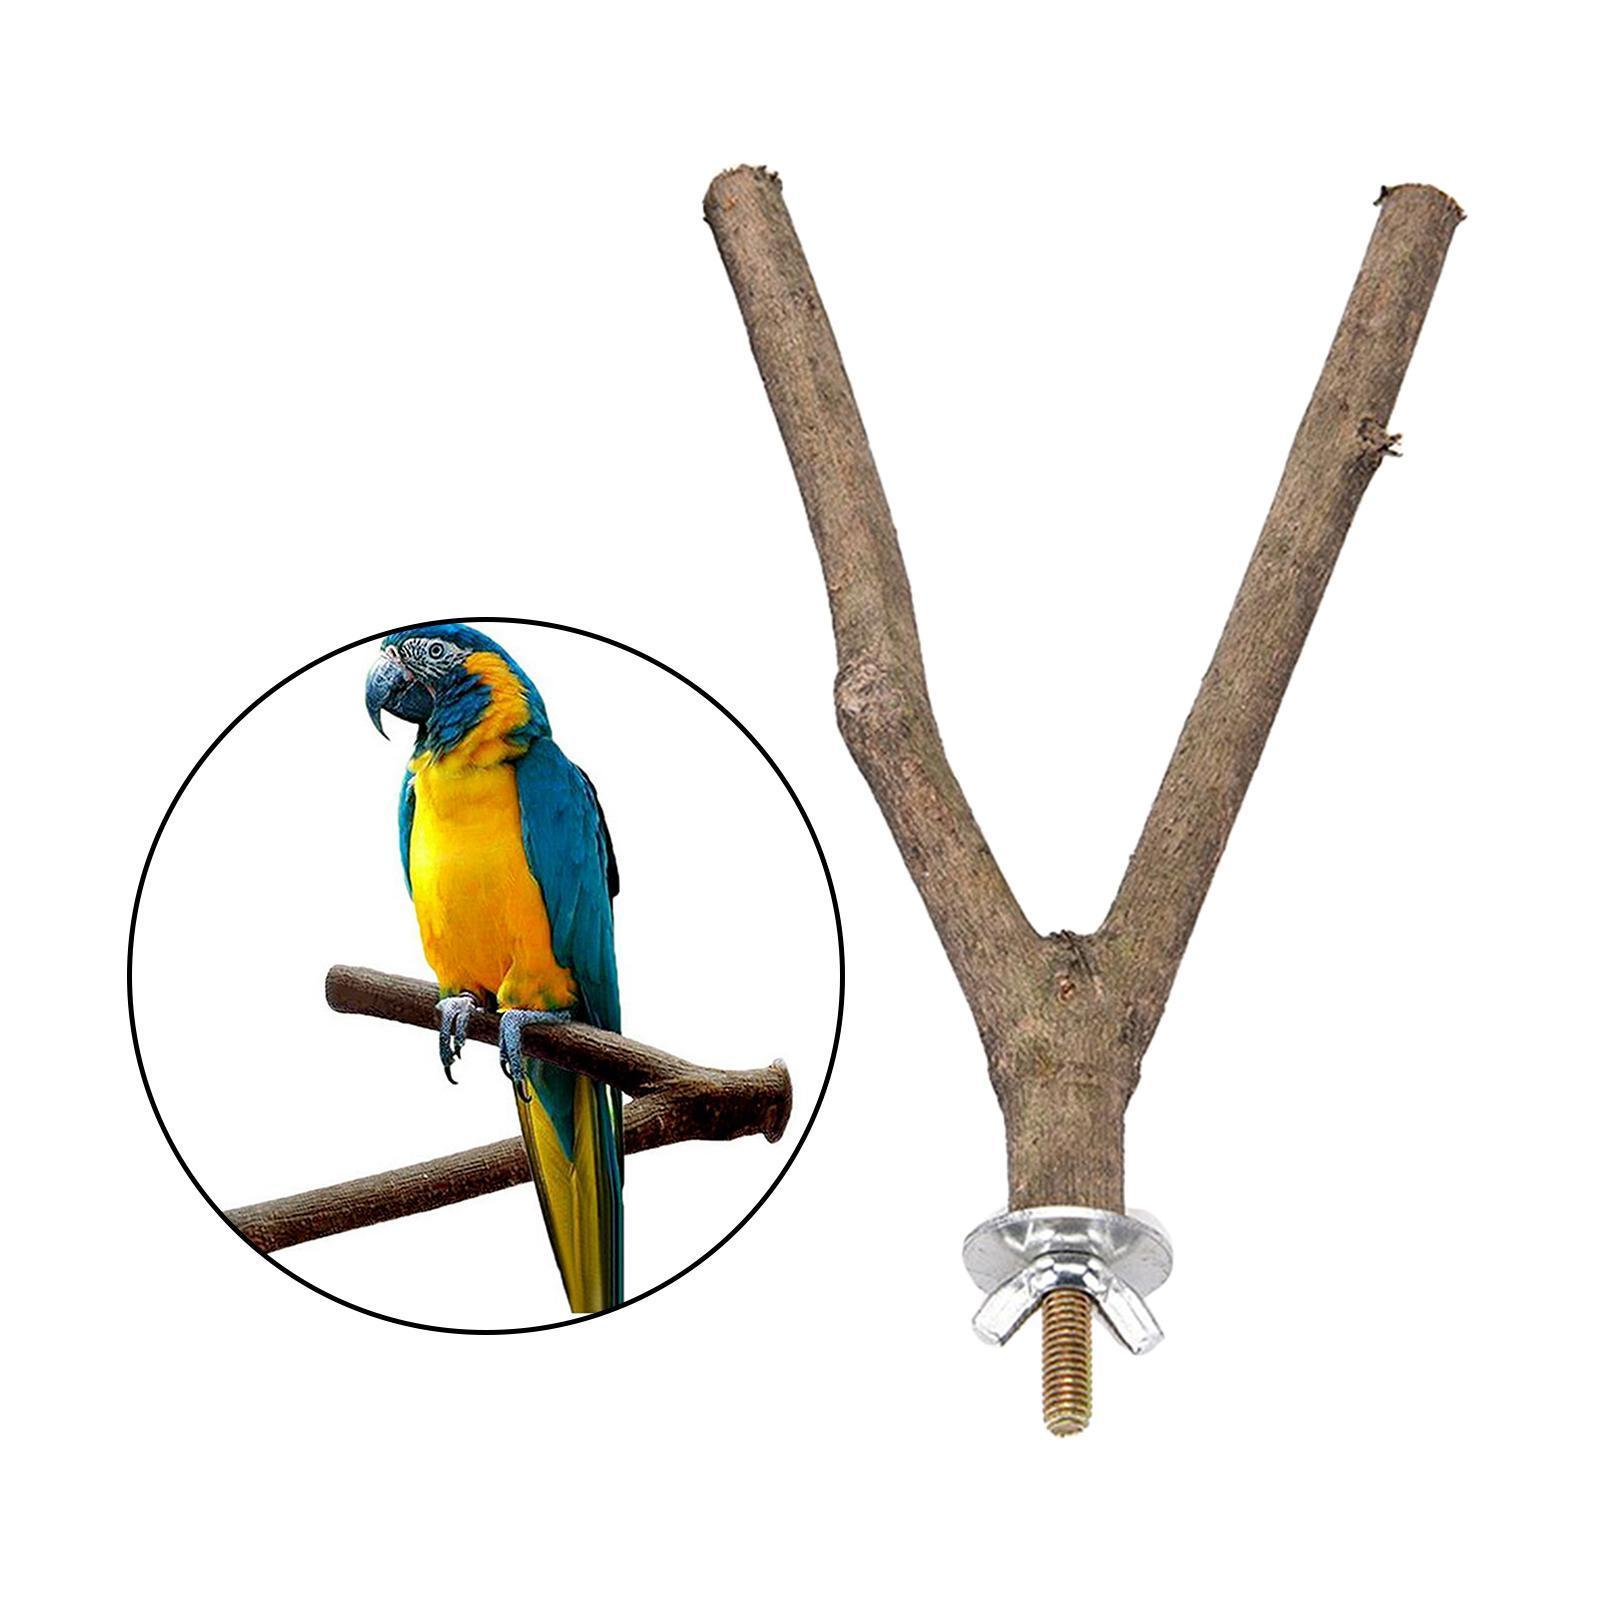 thumbnail 42 - Bird-Perch-Wood-Stand-Bird-Cage-Swing-Branch-for-Parrot-Parakeet-Cockatiel